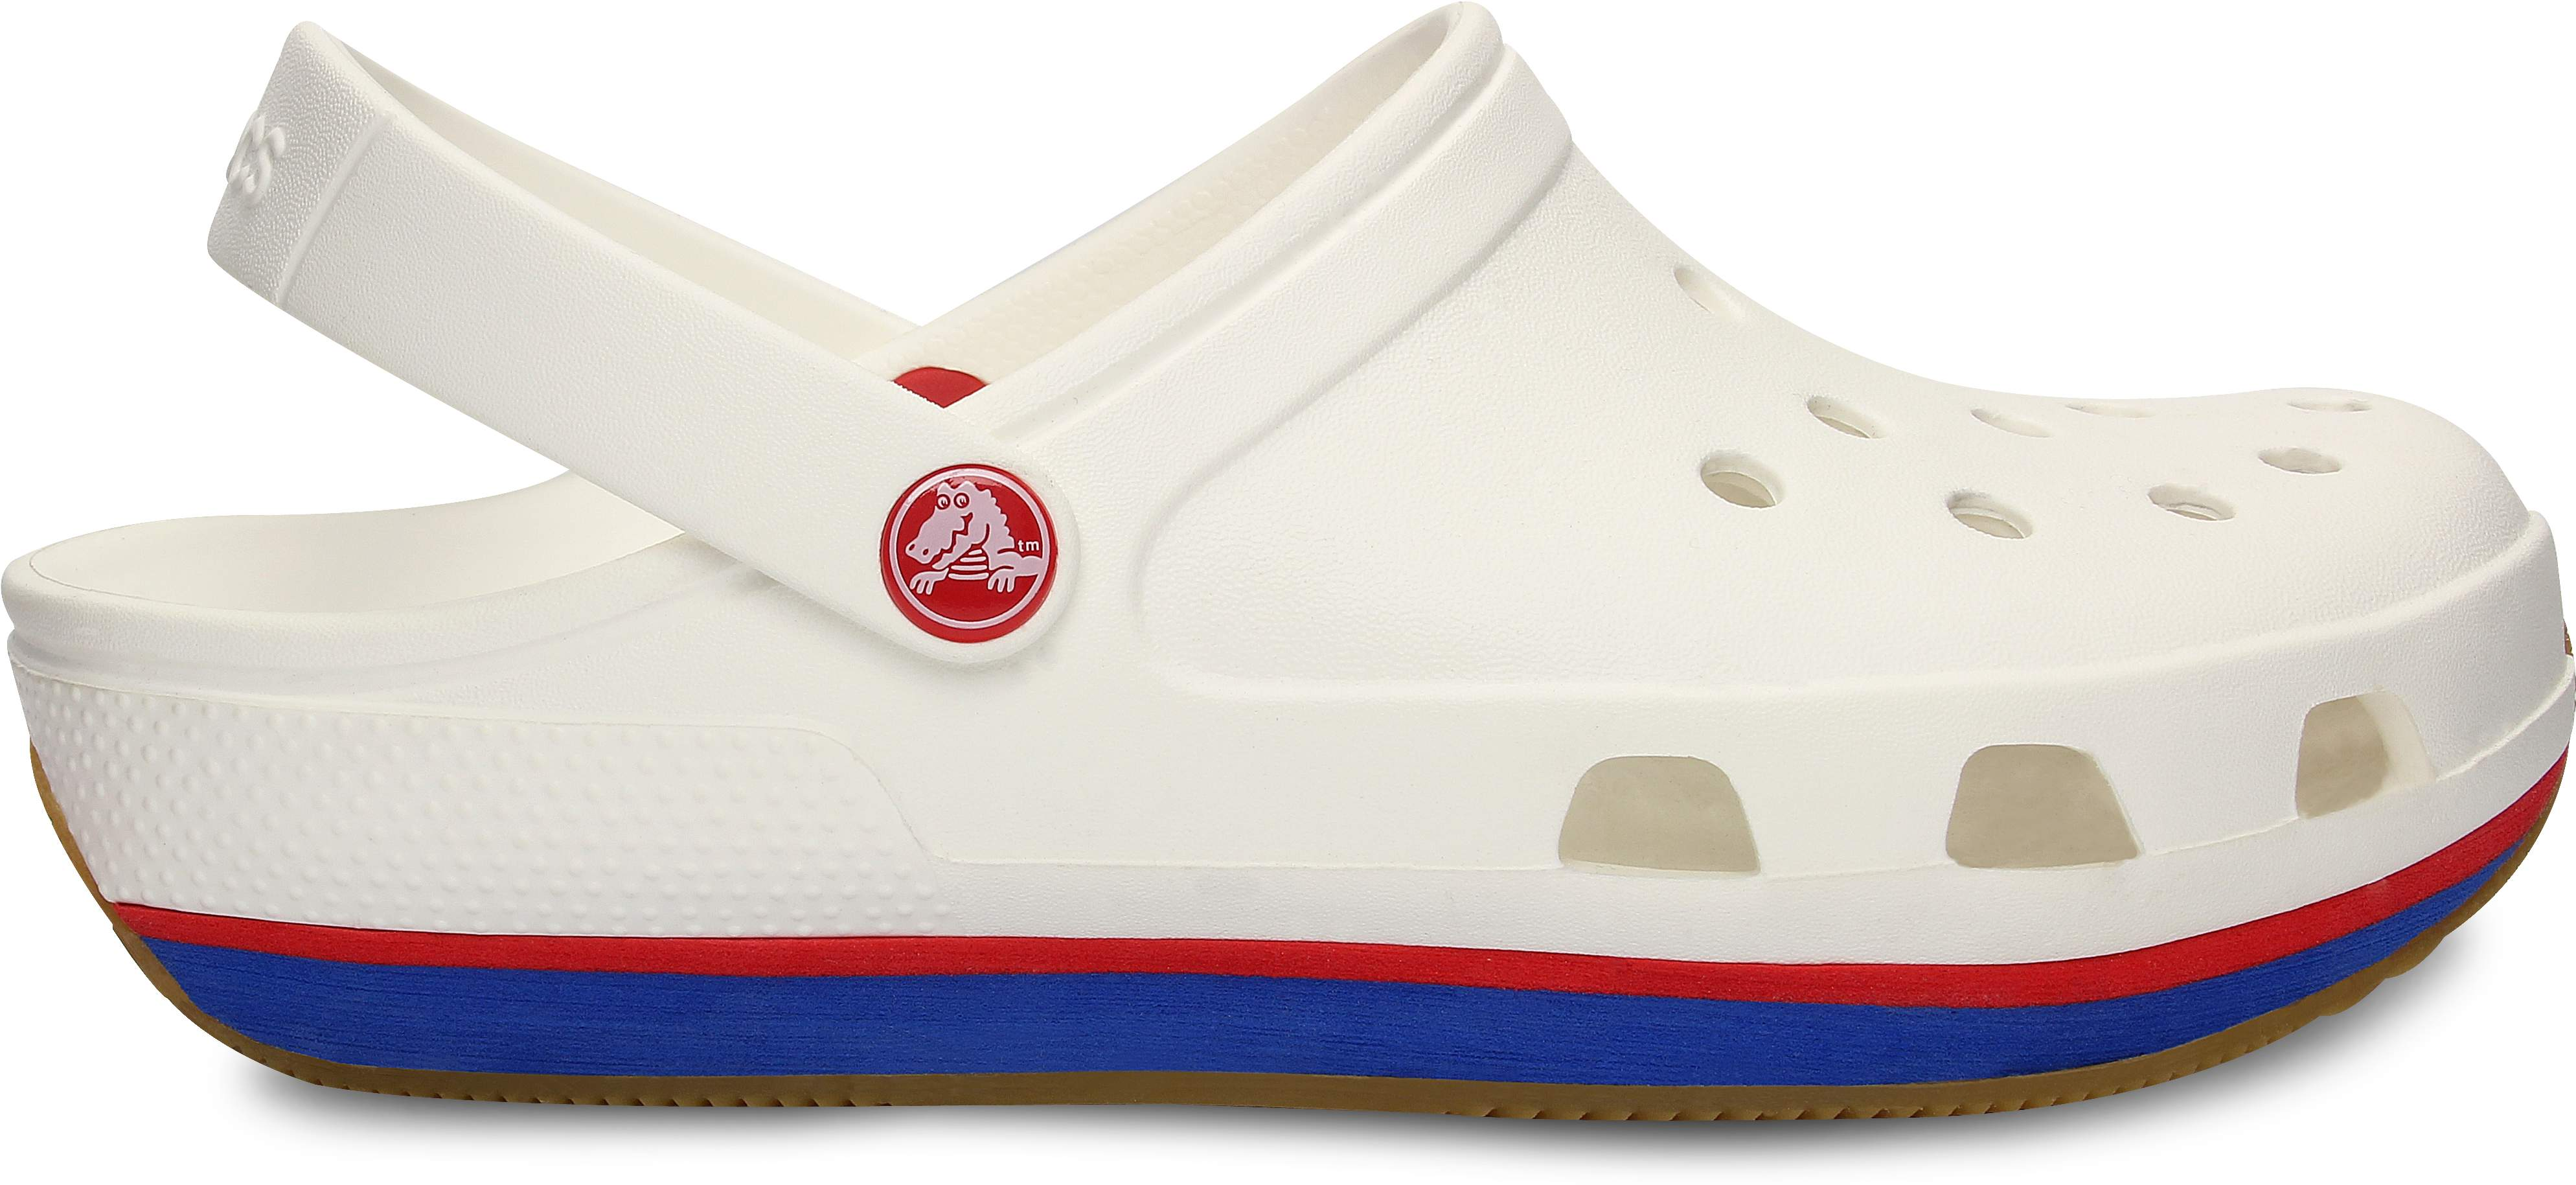 Crocs<br /> Retro Clog